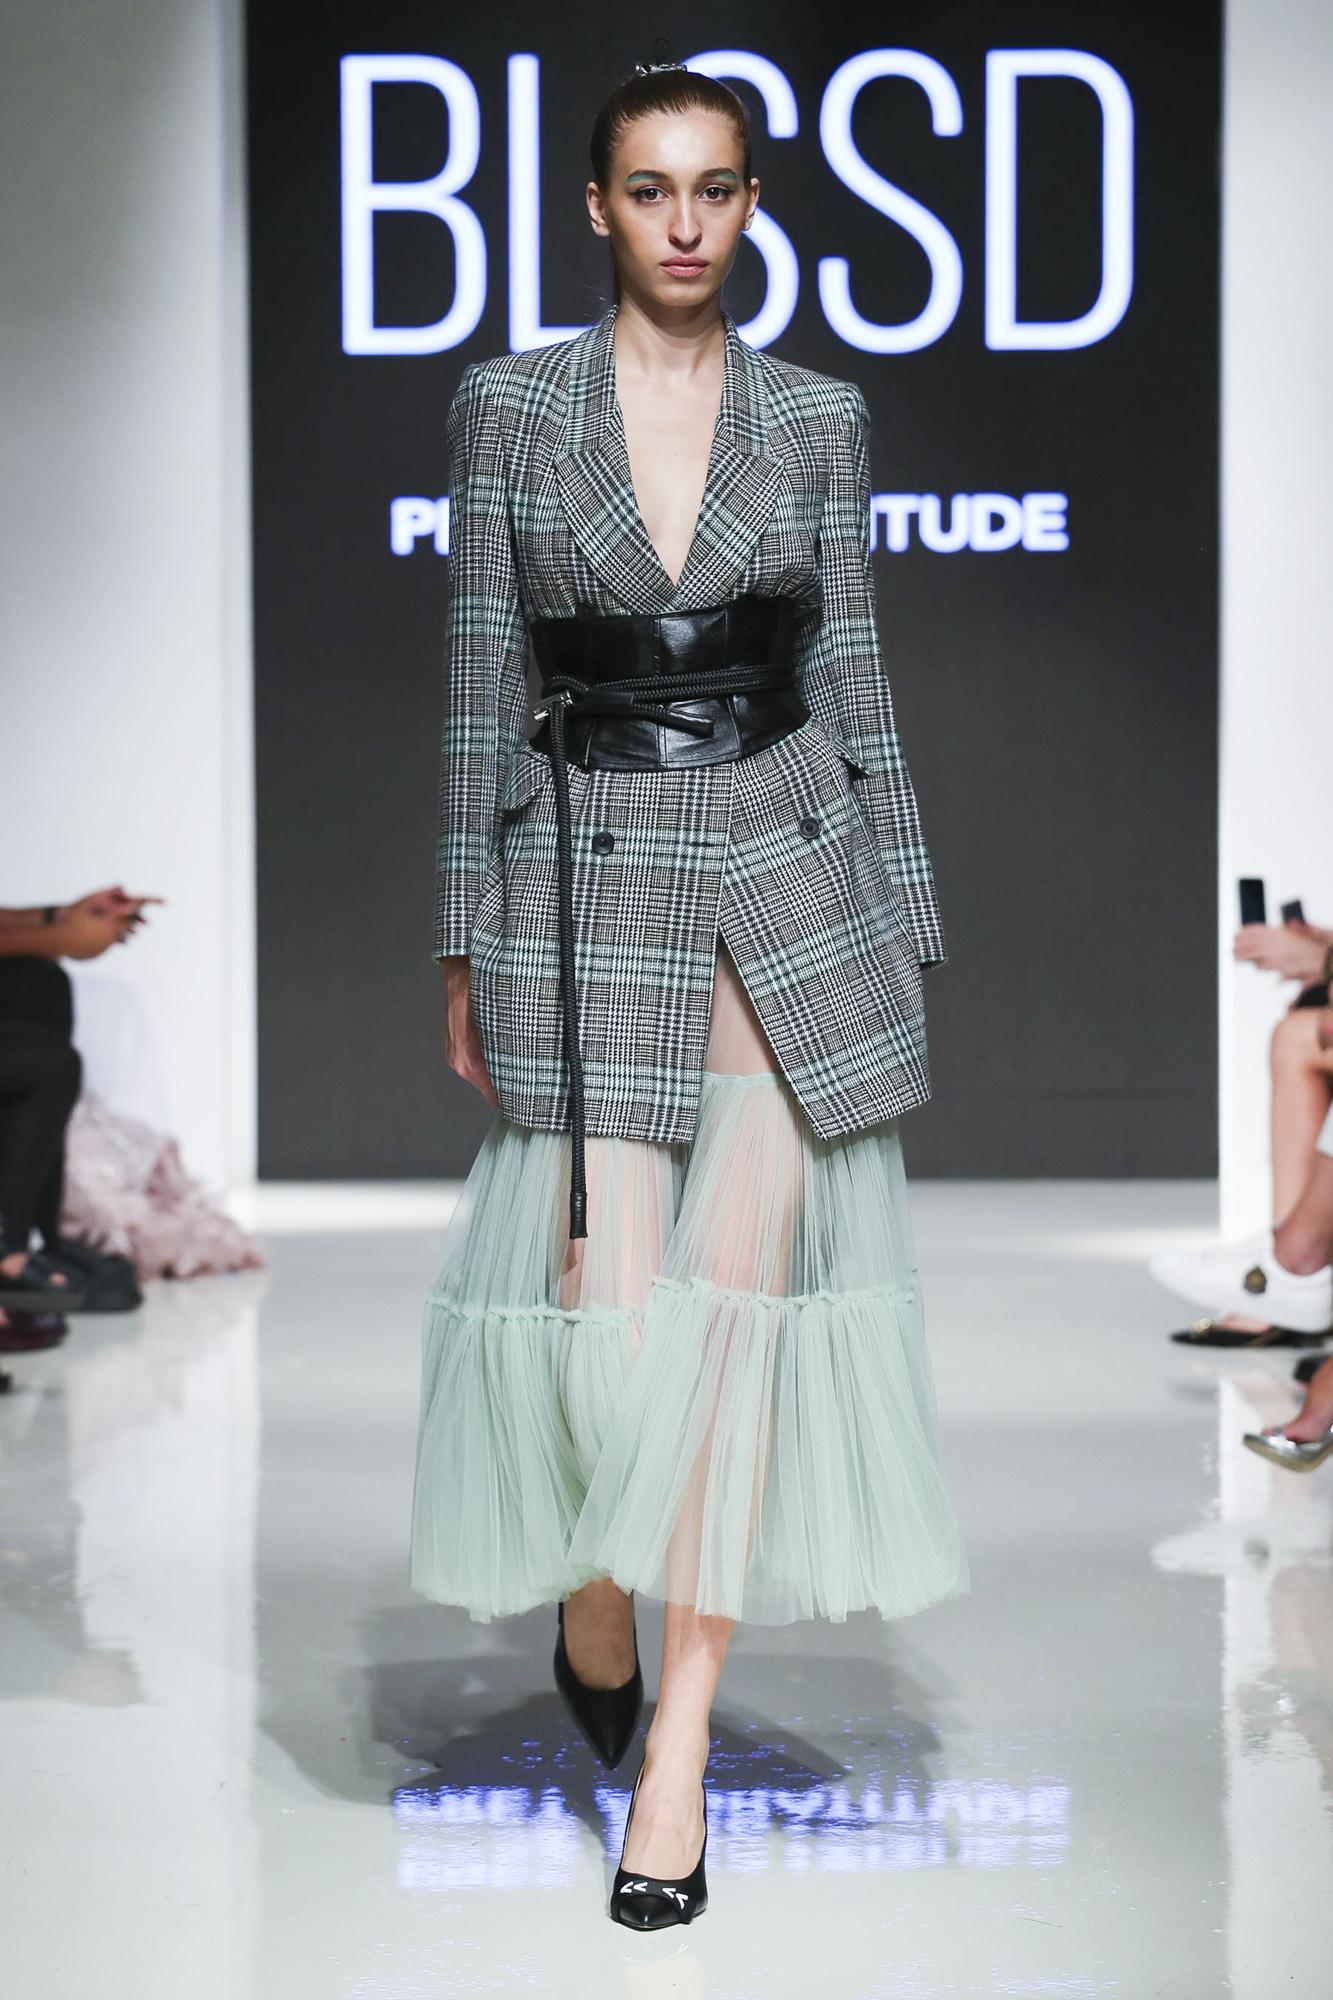 Blssd fashion show, Arab Fashion Week collection Spring Summer 2020 in Dubai